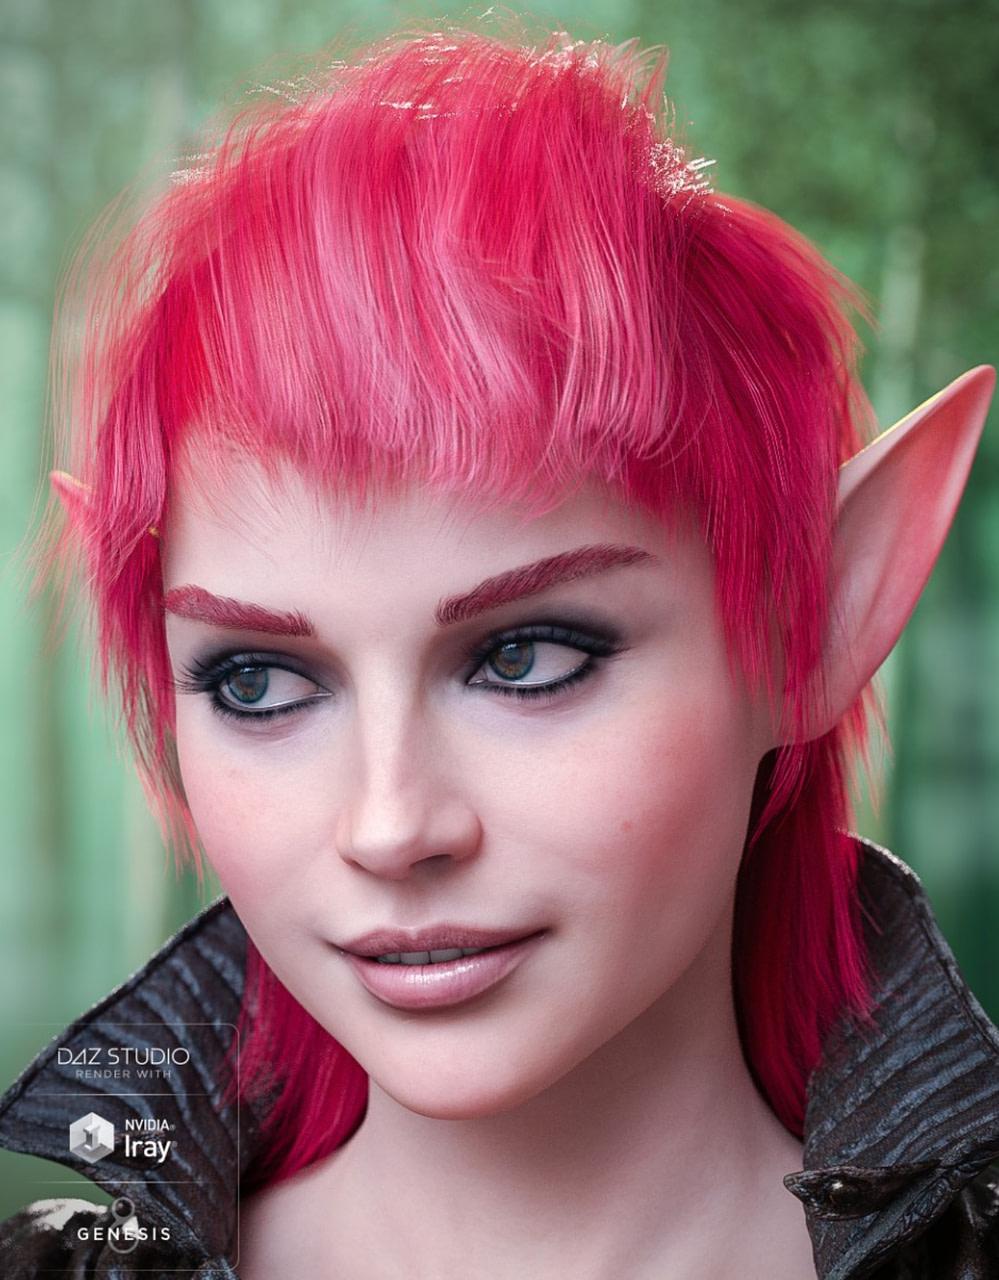 daz3d fallow hair colors